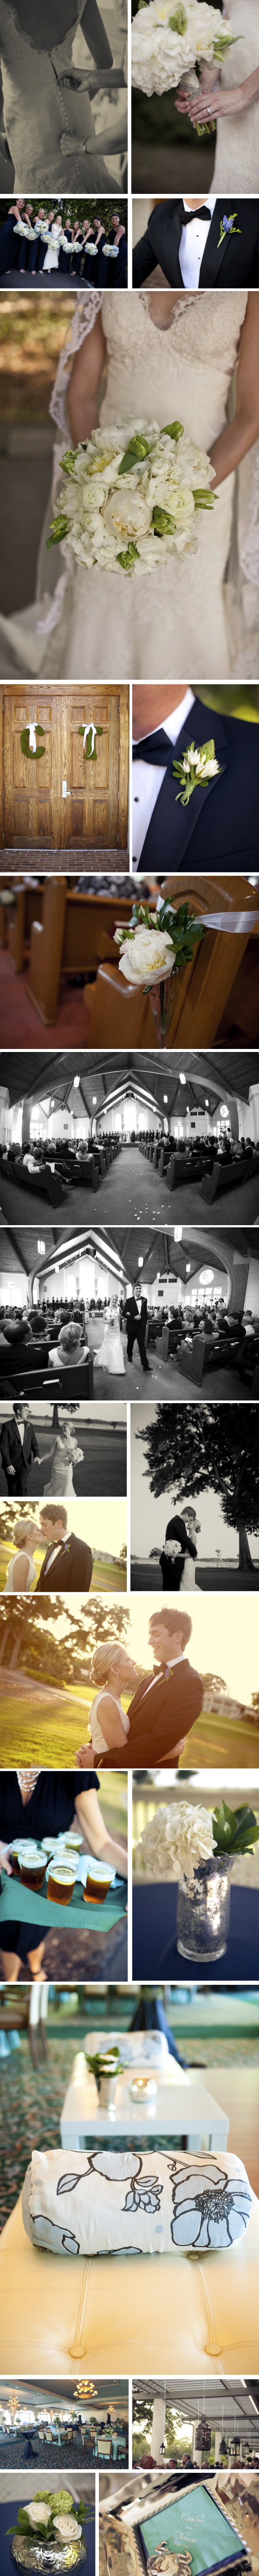 Wedding blogs | southern wedding